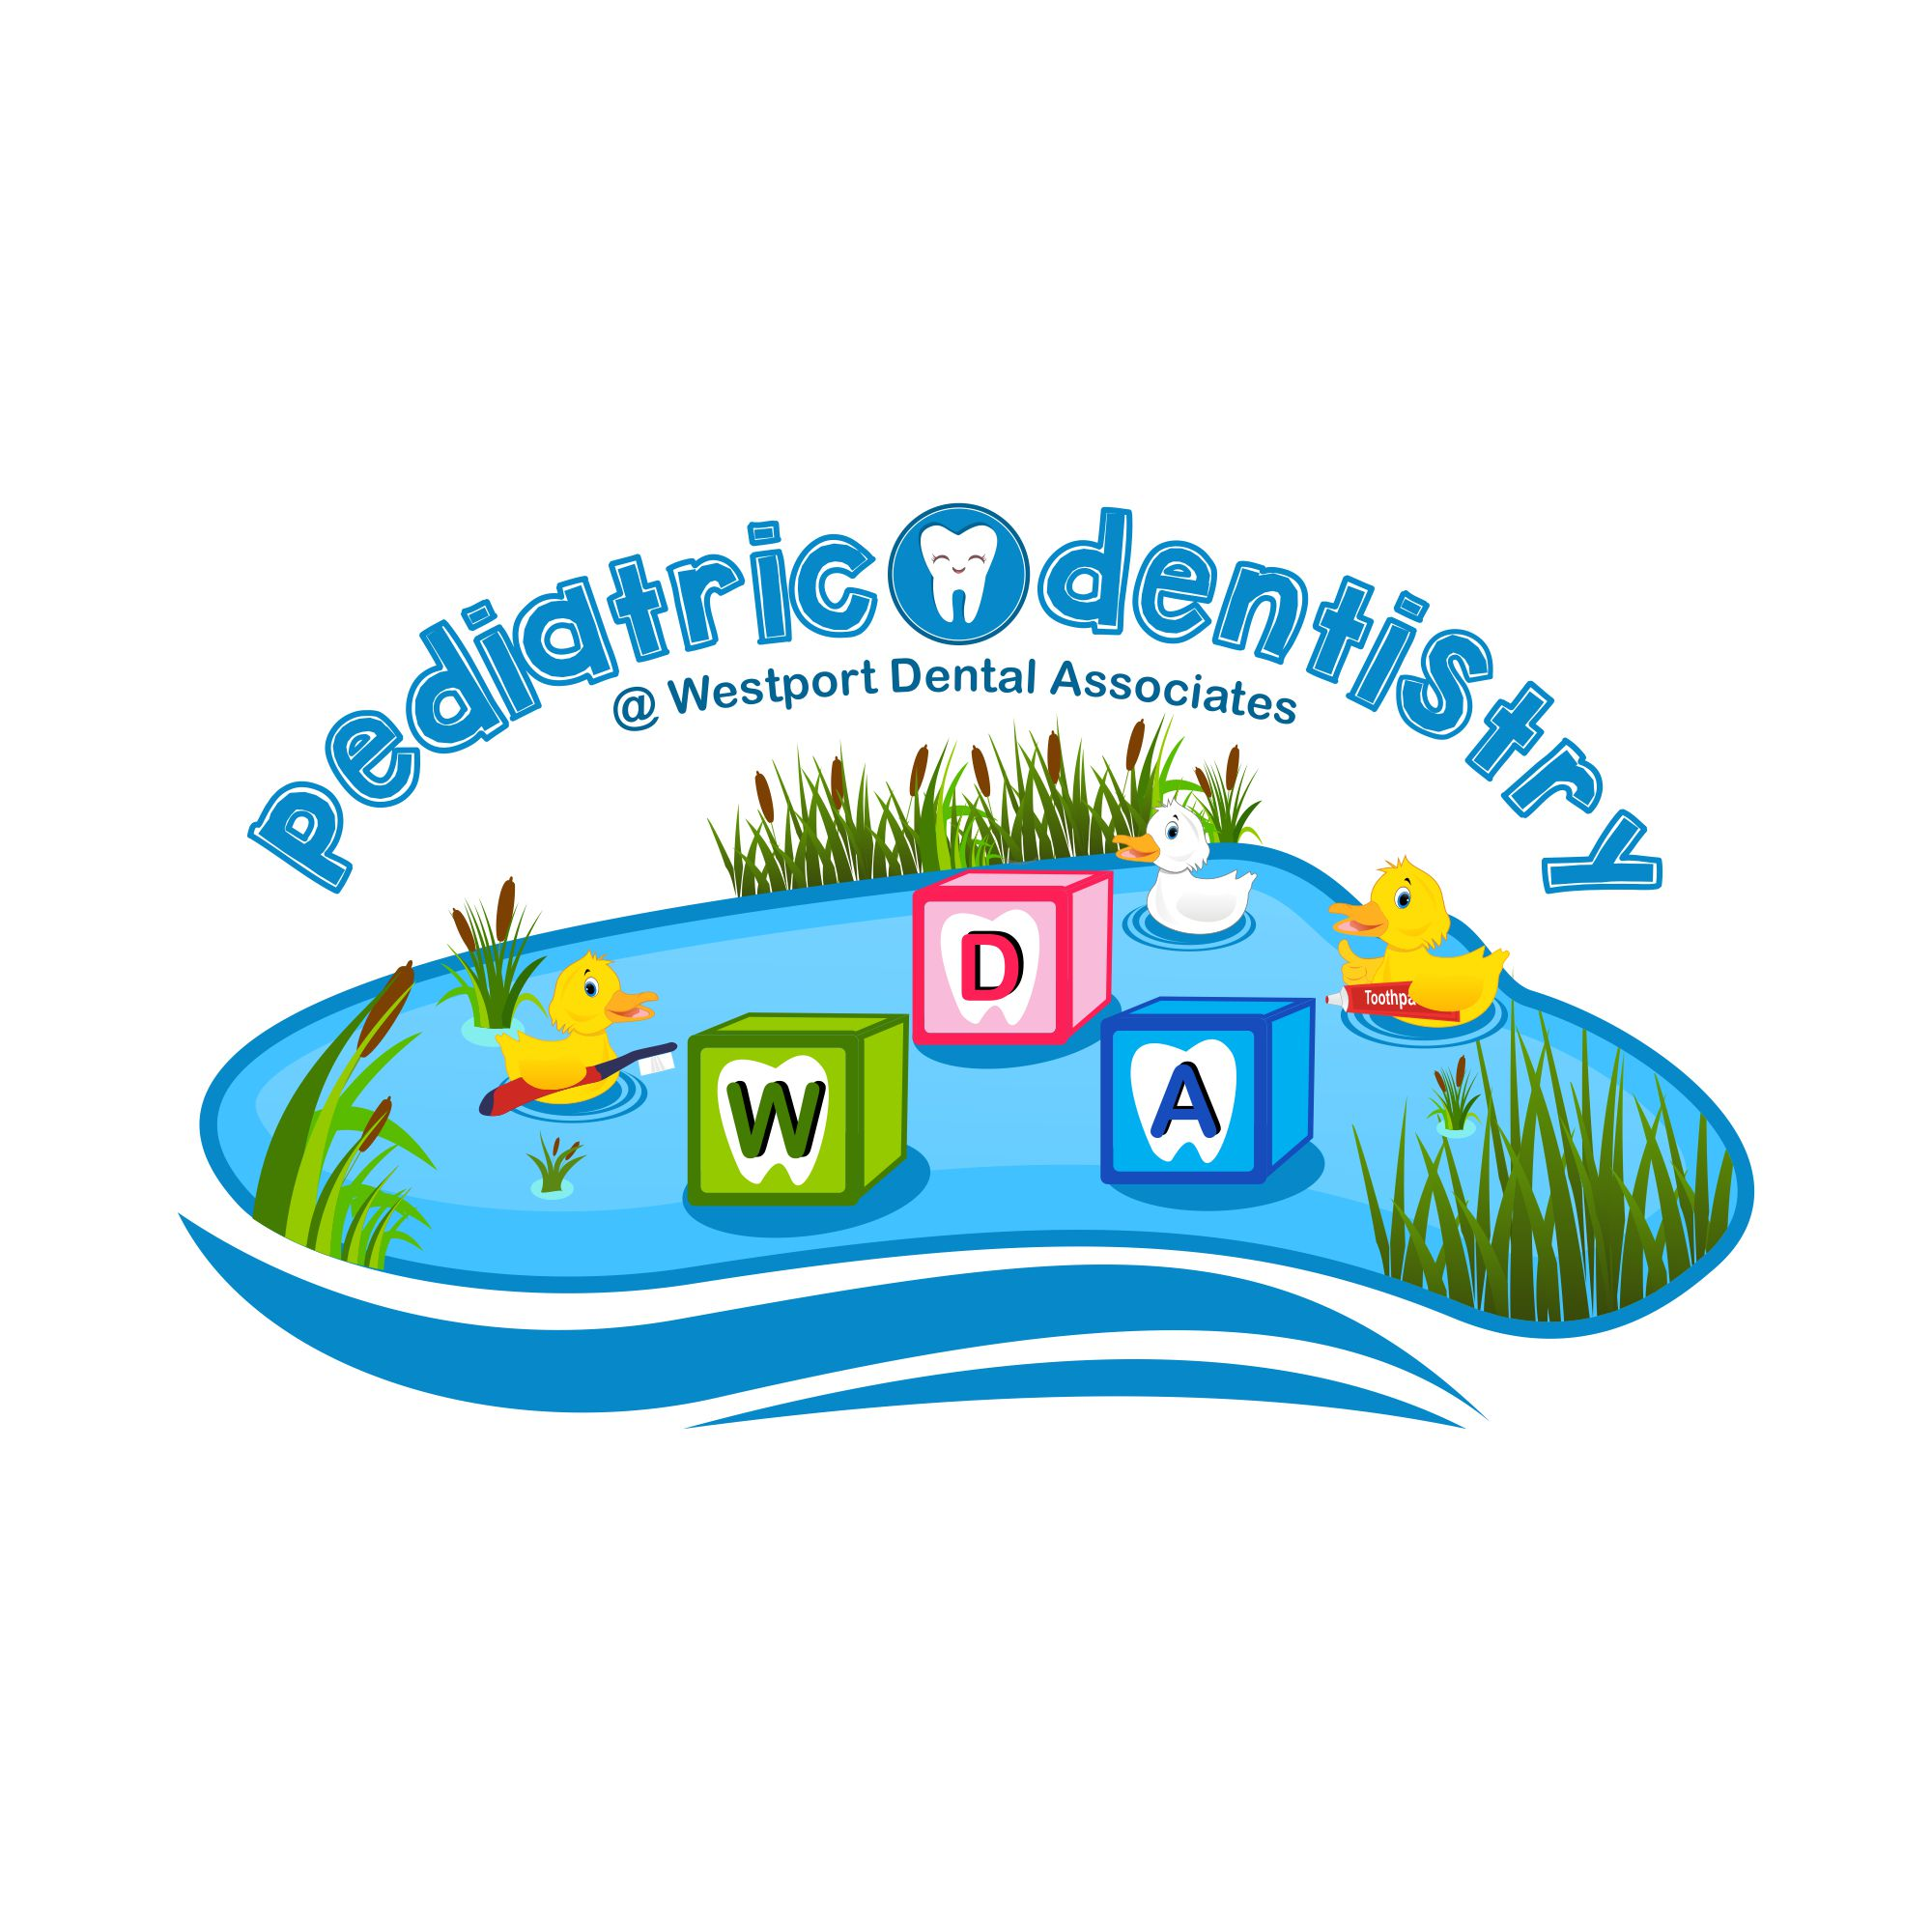 Duck17 - logo - Pediartic Dentistry JPG small.jpg